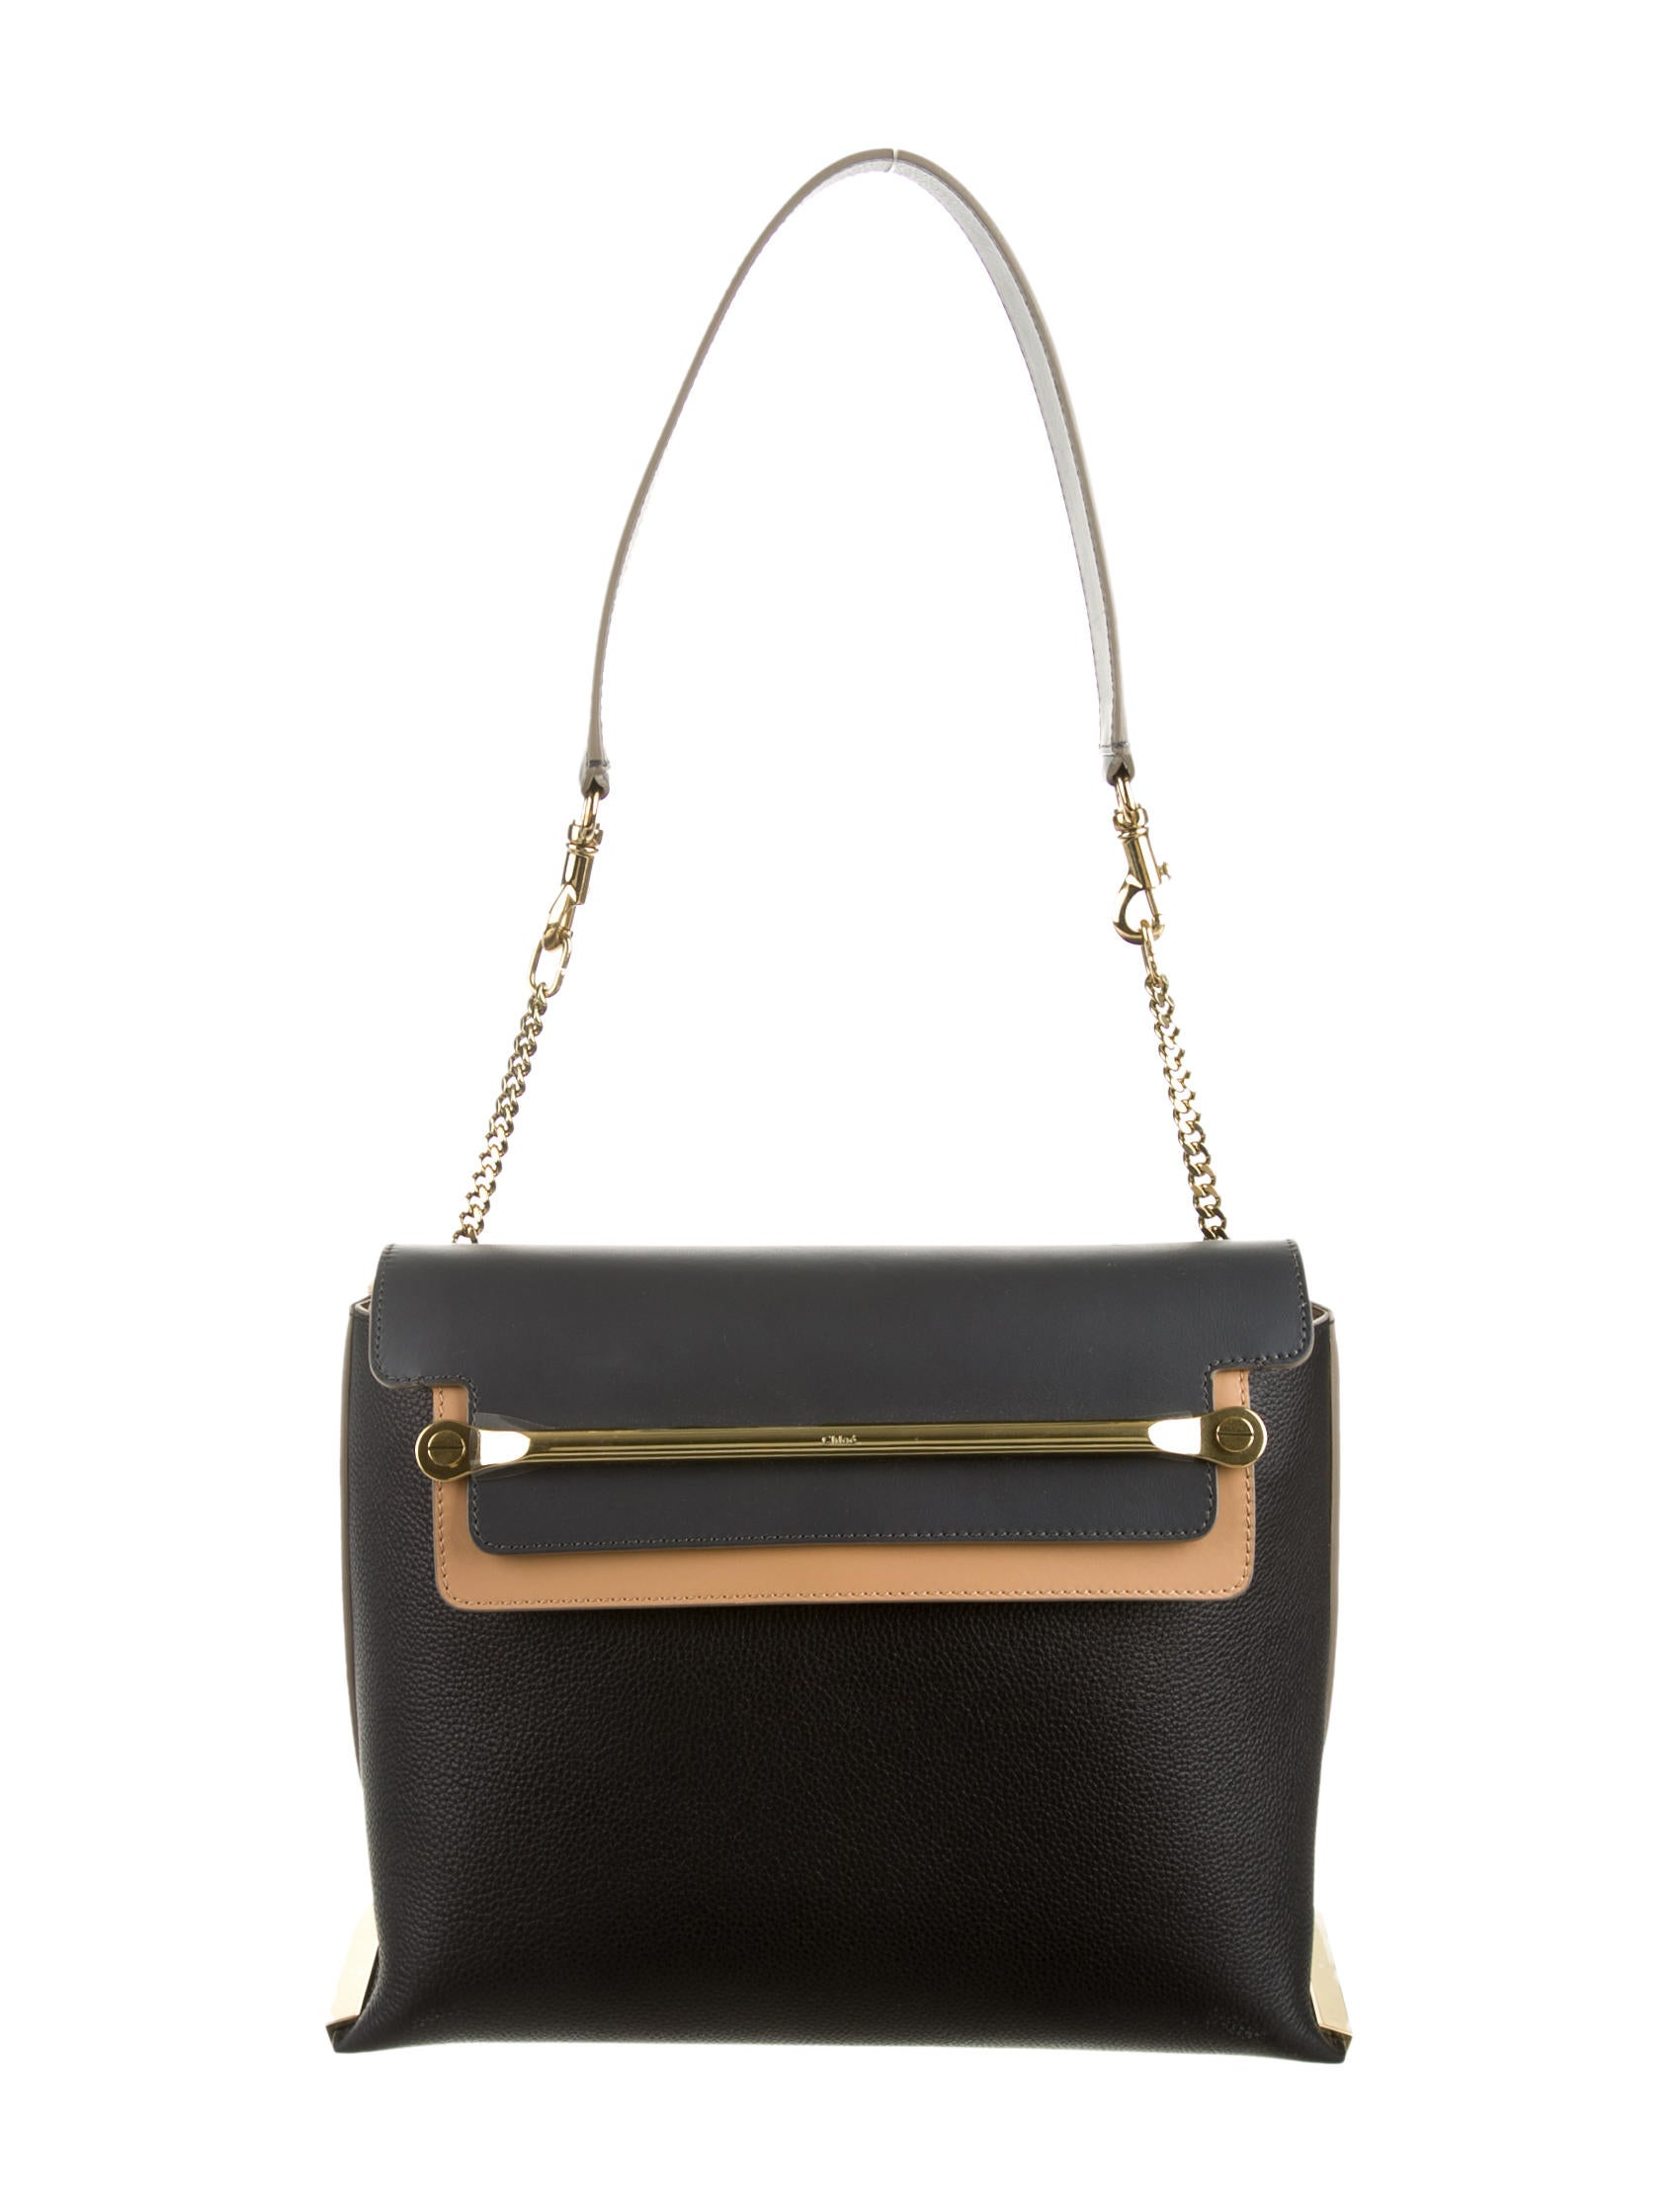 Chlo�� Medium Clare Shoulder Bag - Handbags - CHL30596 | The RealReal